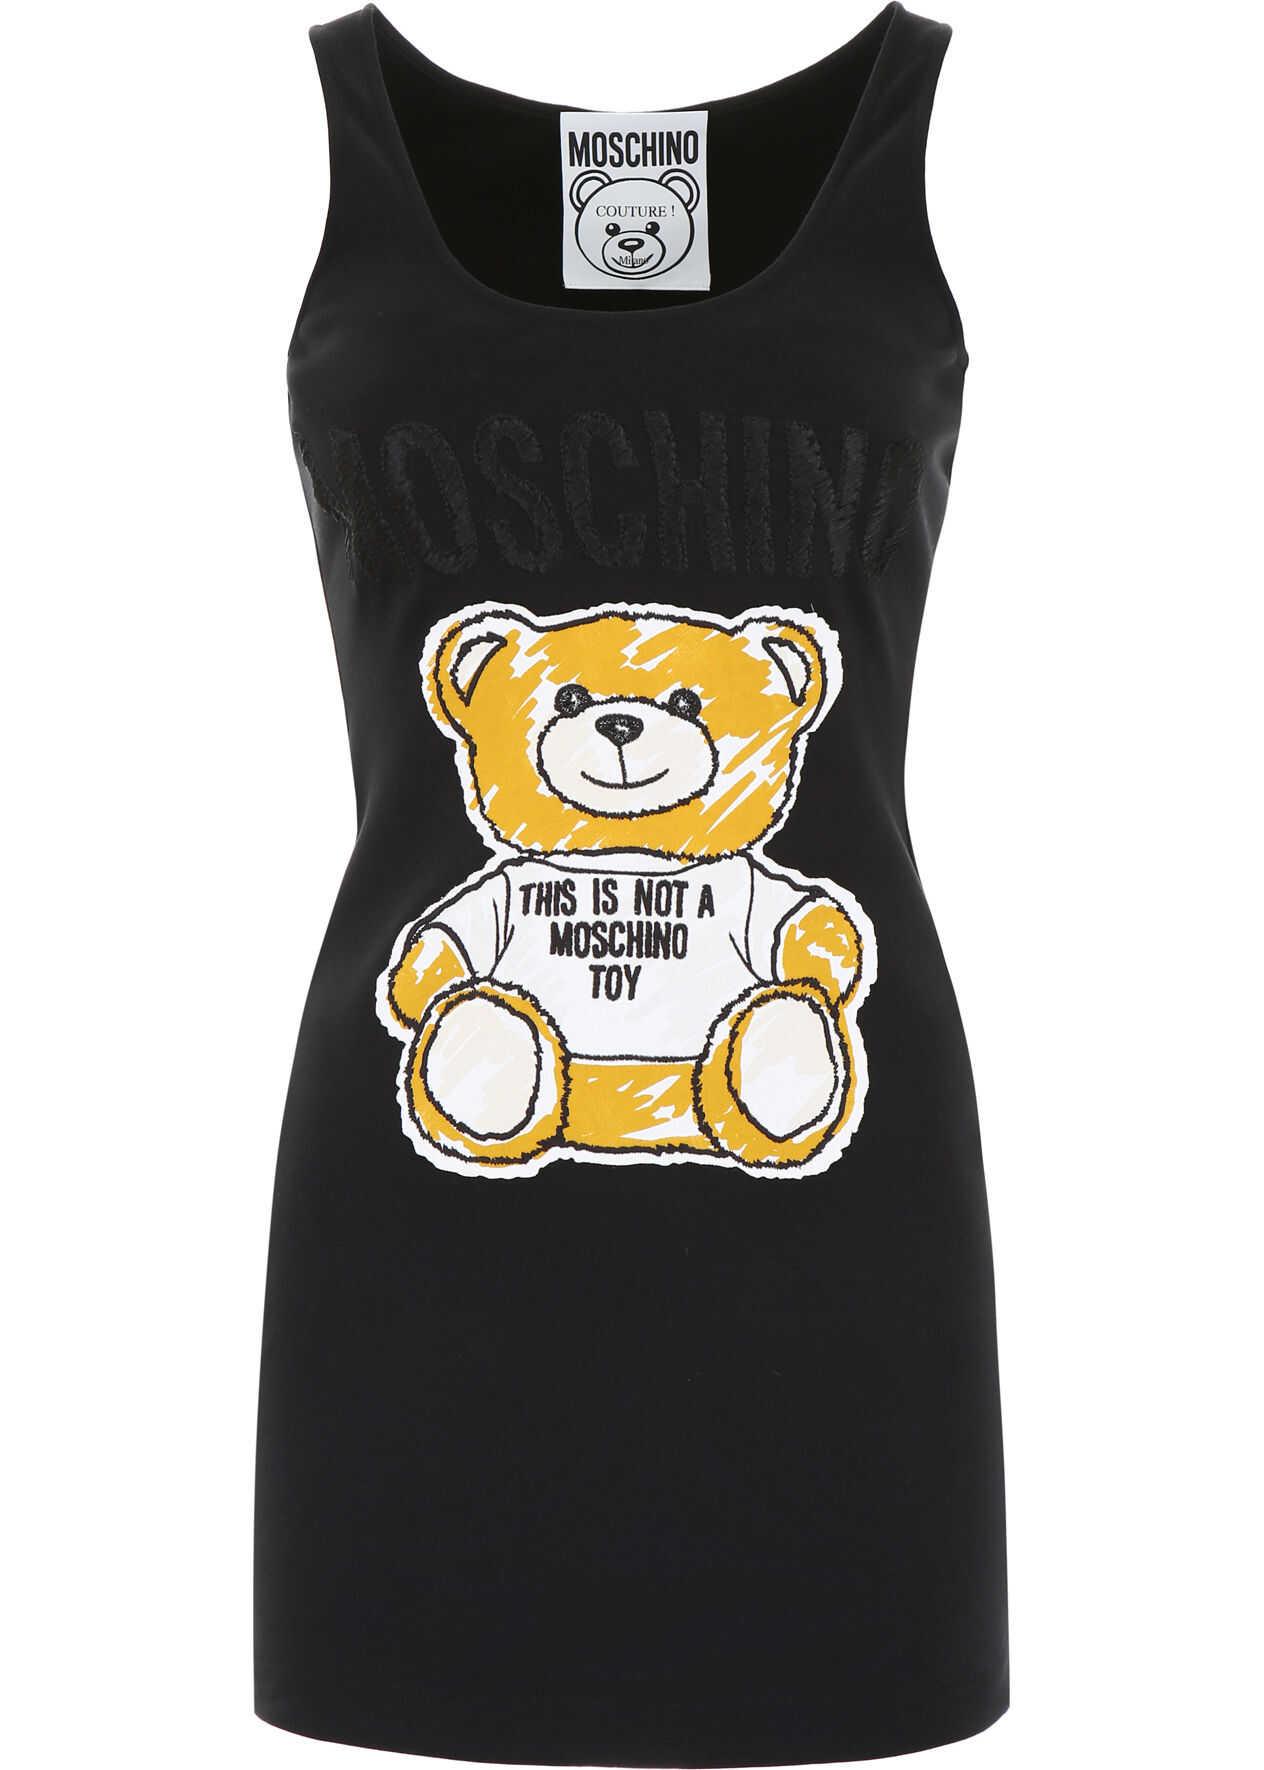 Moschino Teddy Bear Dress BLACK